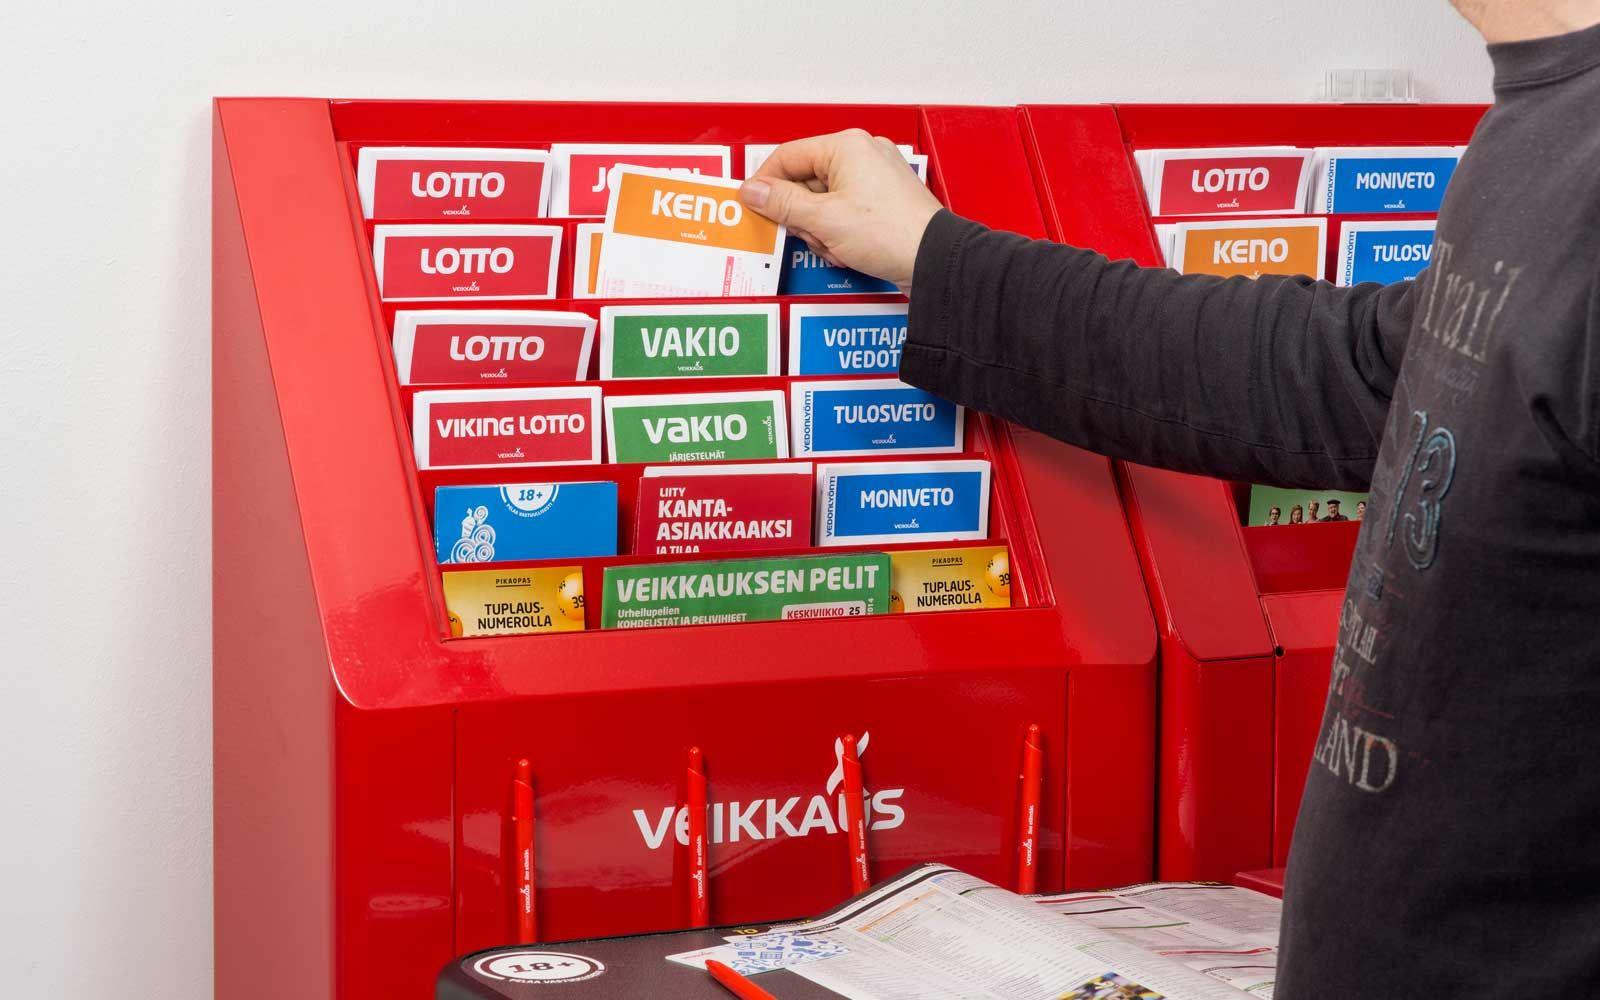 VEIKKAUS POINTS KOODI R-KIOSKI 2019